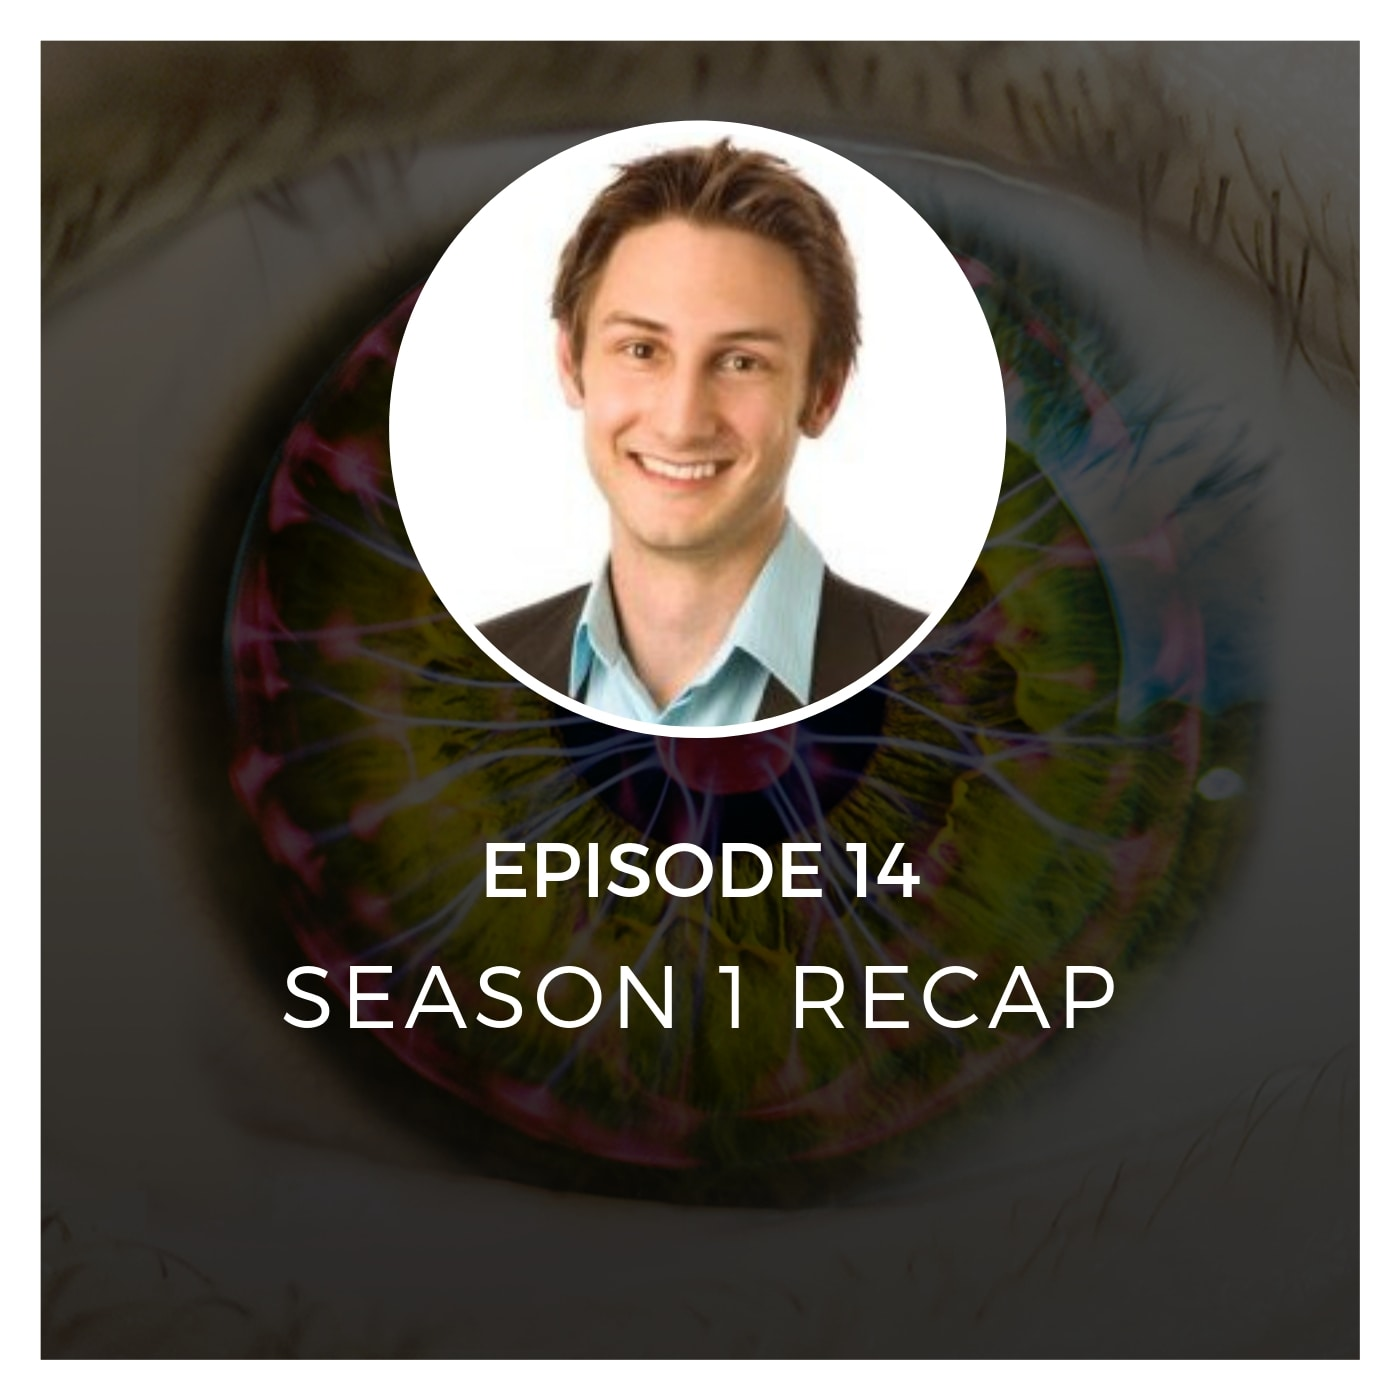 Season 1 Recap - Episode 14